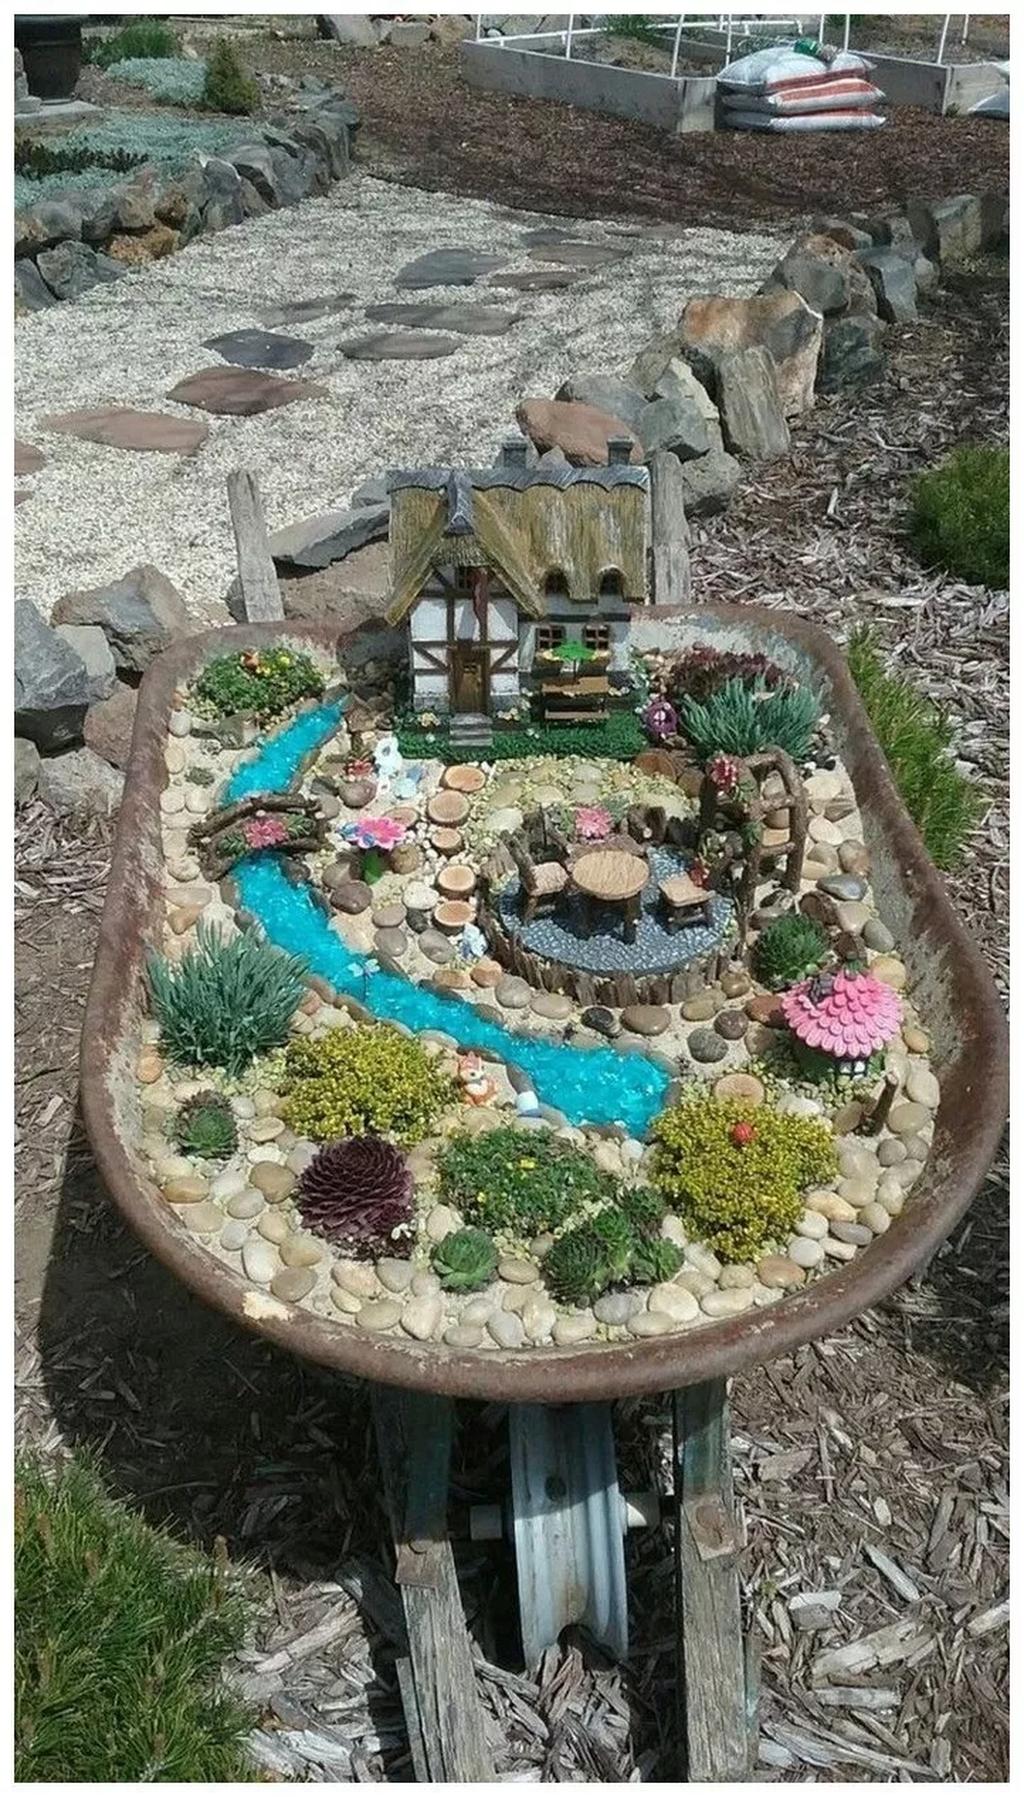 30 Perfect Fairy Garden Ideas To Inspire Your Mini Garden Lovahomy